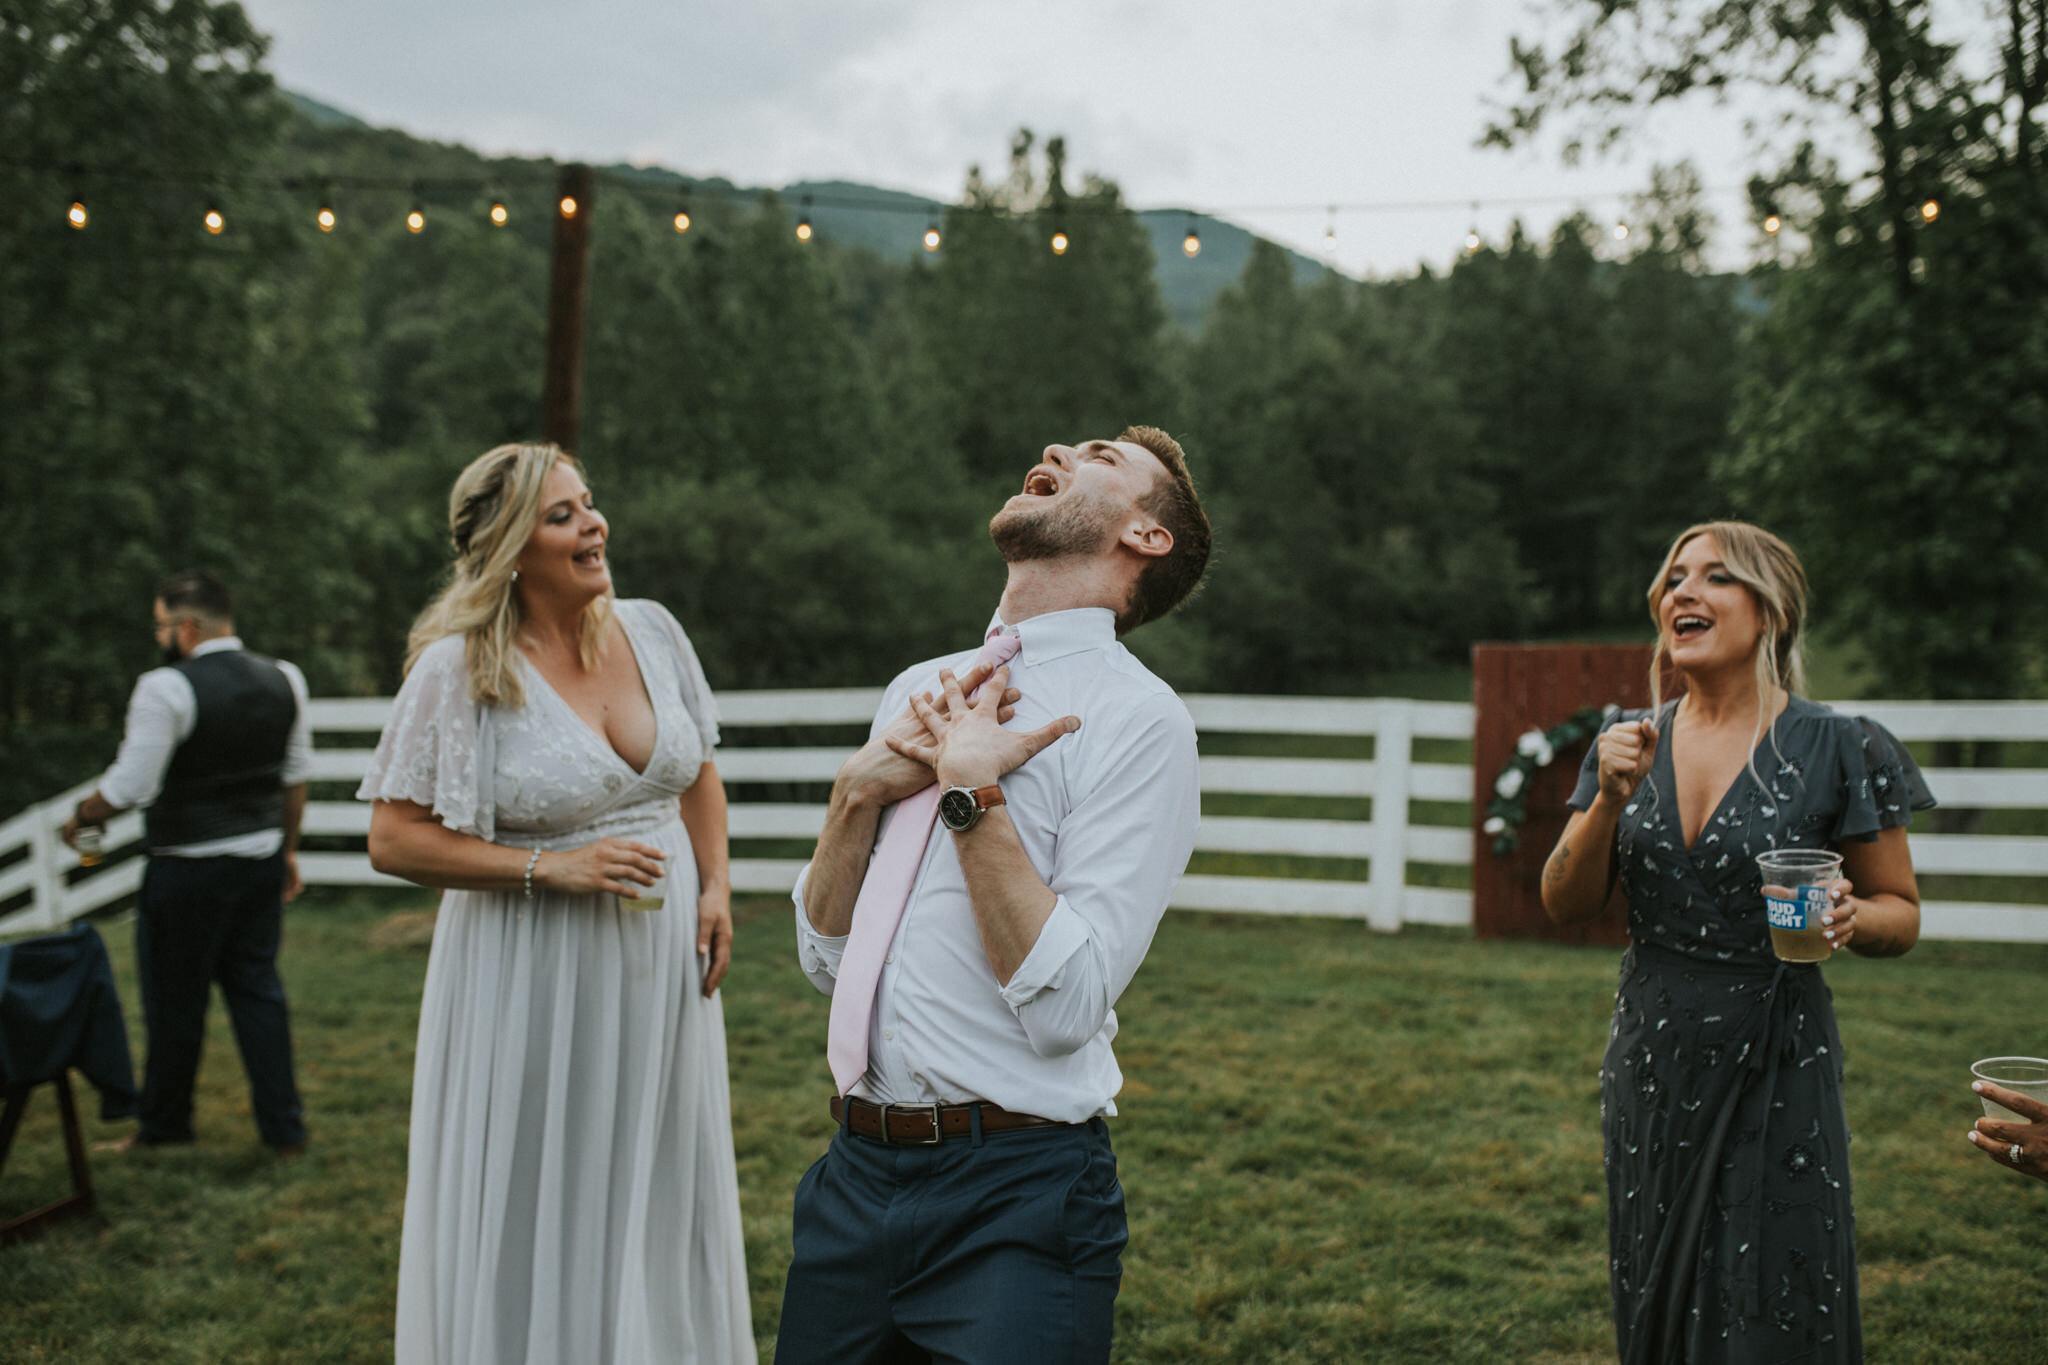 KateMatt-North-Georgia-Wedding-Photographer-Mountain-Laurel-Farm-153.jpg